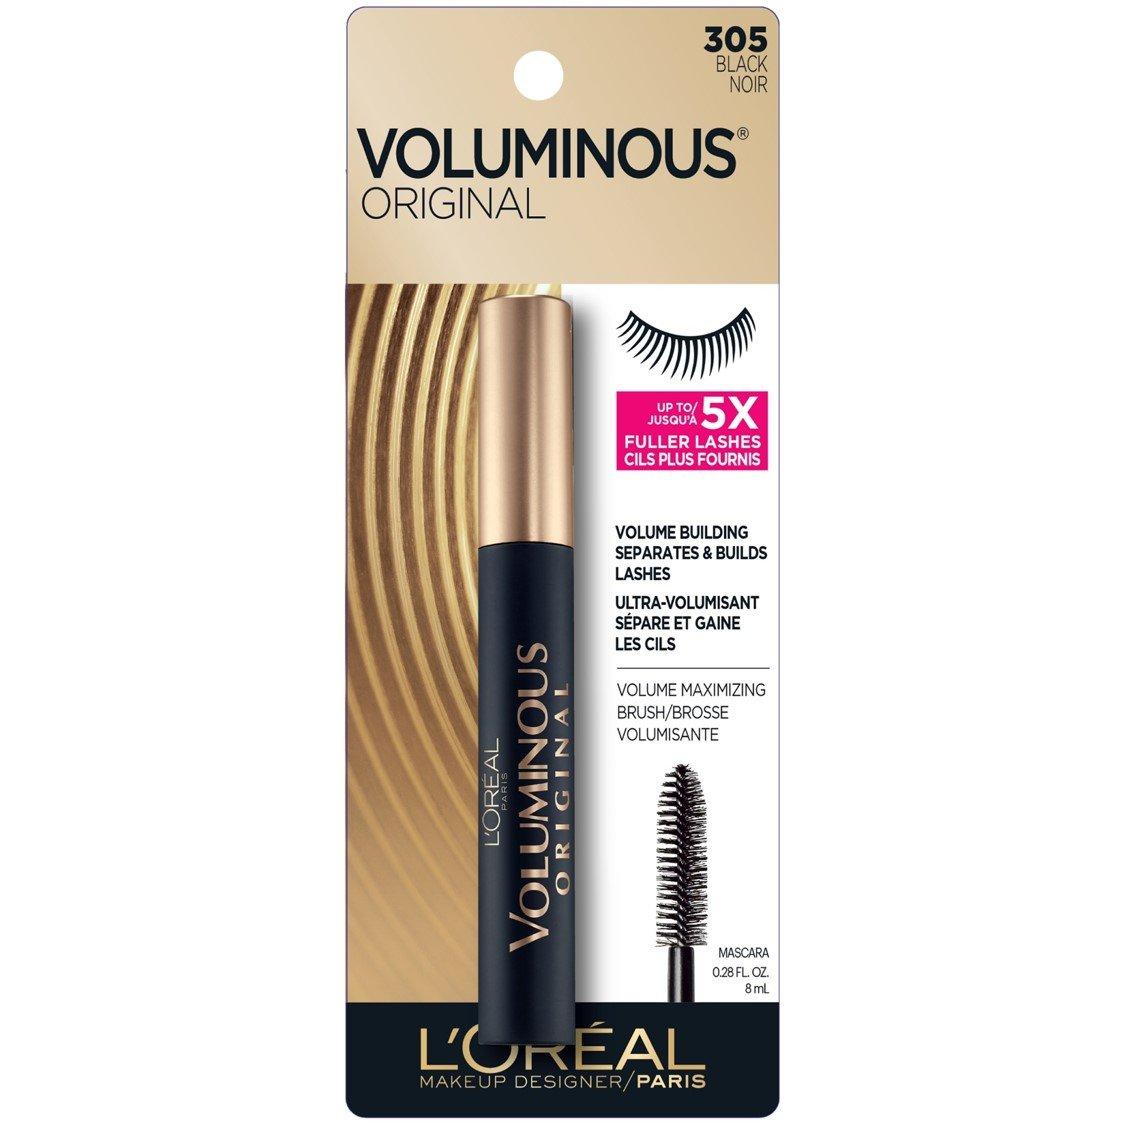 d9aba19afc6 Amazon.com : L'Oreal Paris Voluminous Original Mascara, Black [305] 0.28 oz  : Beauty